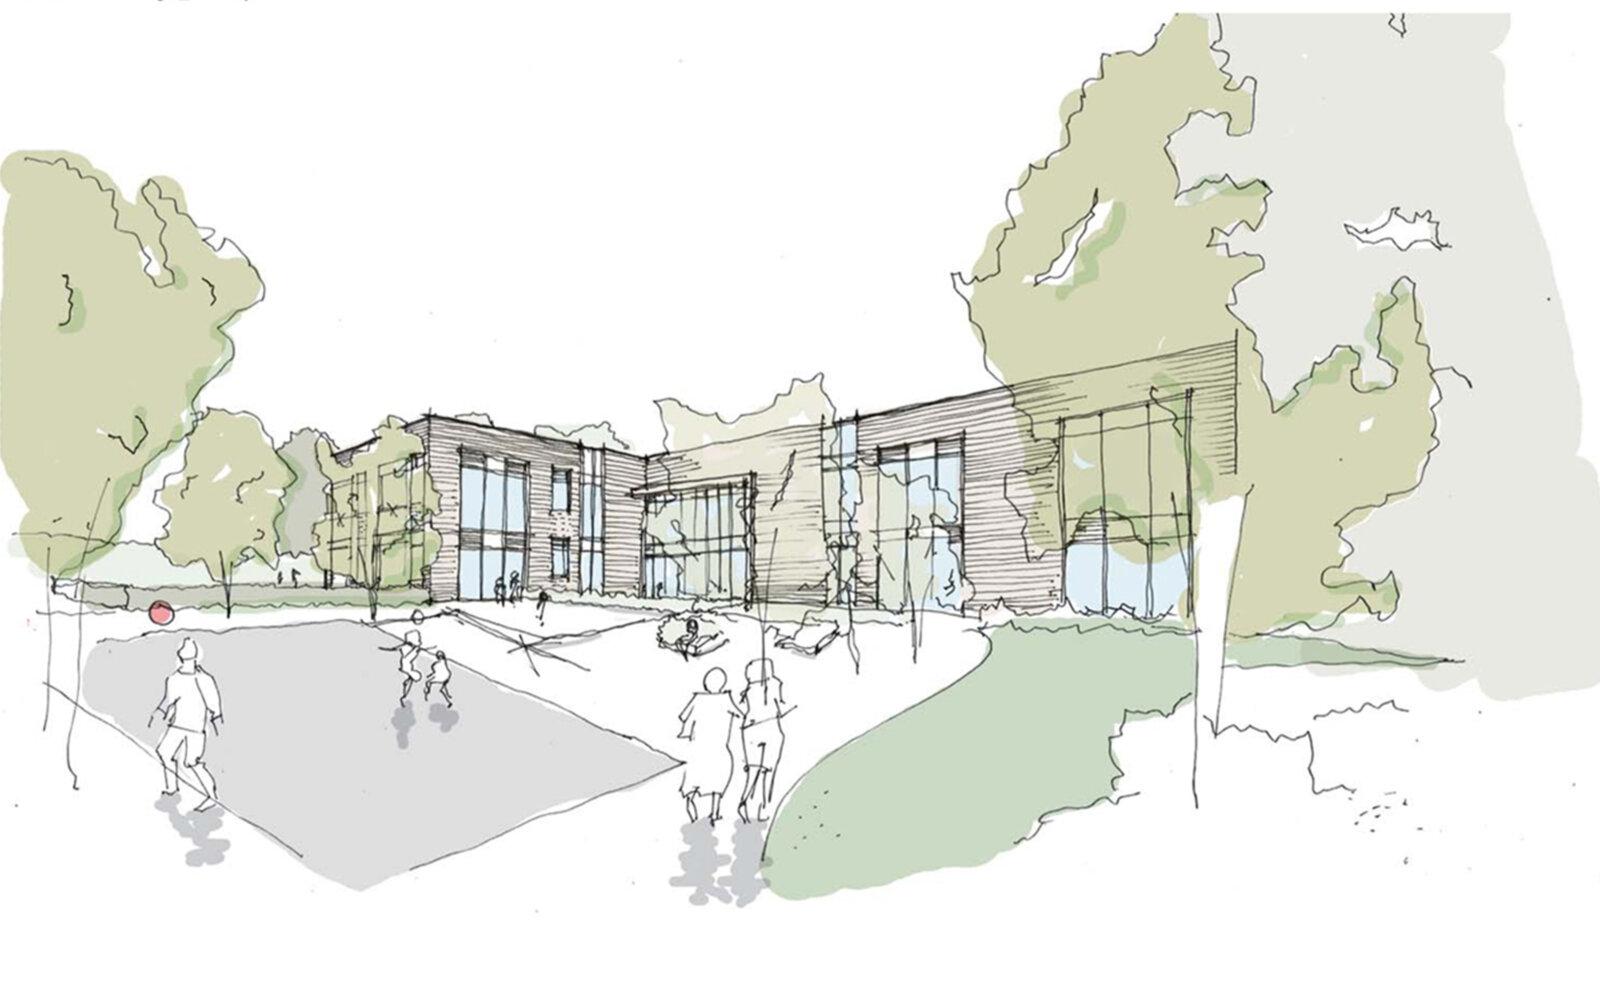 Meadowbrook School courtyard sketch